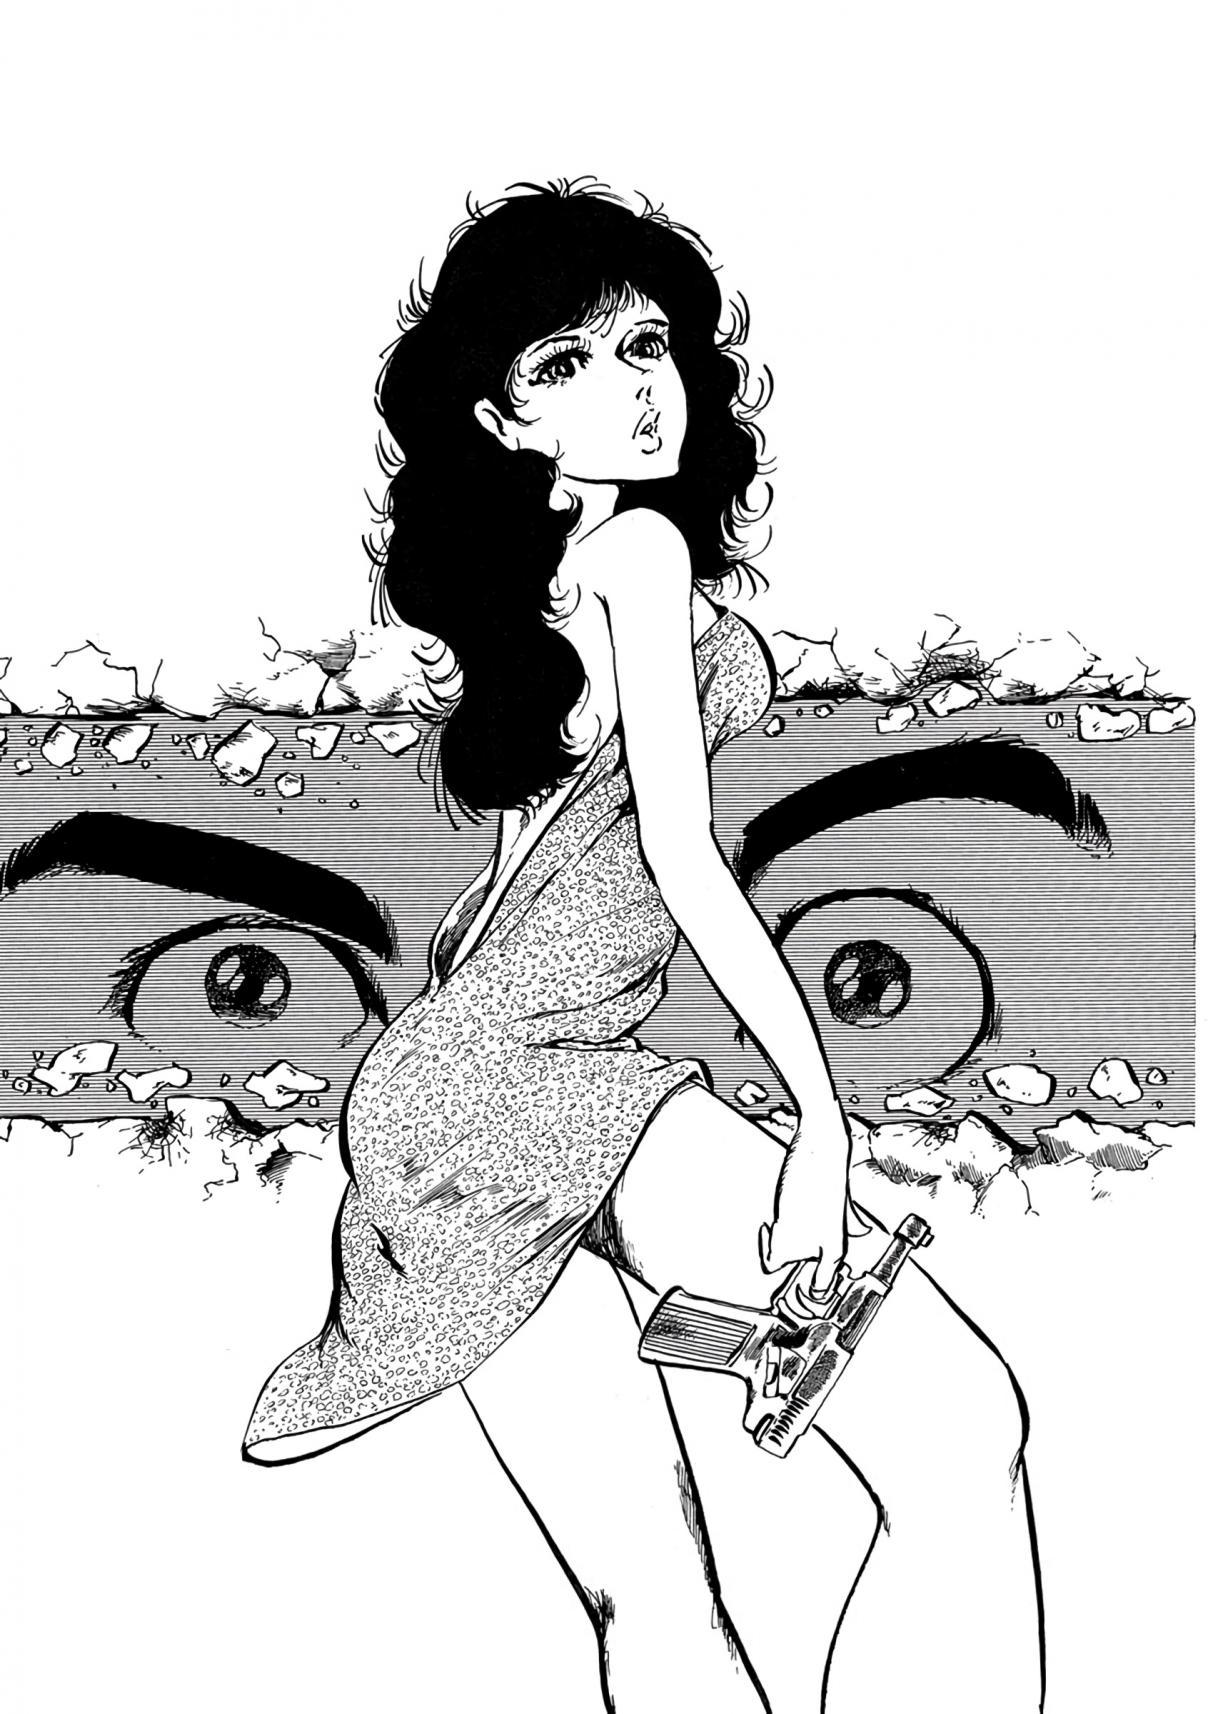 https://img3.nineanime.com/comics/pic4/20/46292/2755316/eef6f4457ee96f8bae1893f5b234d238.jpg Page 1